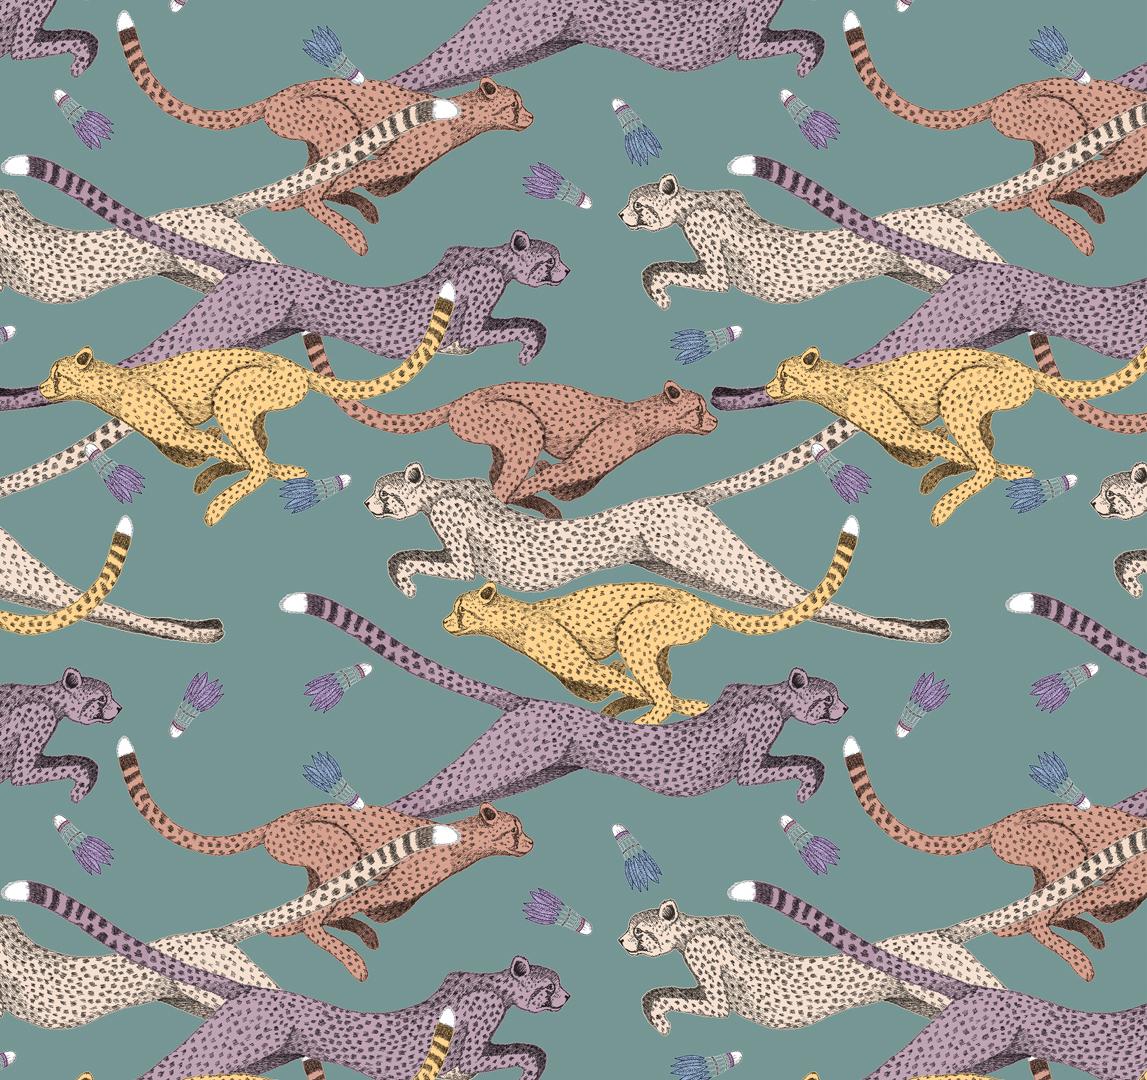 Allira_Cheetahs-and-Shuttlecocks